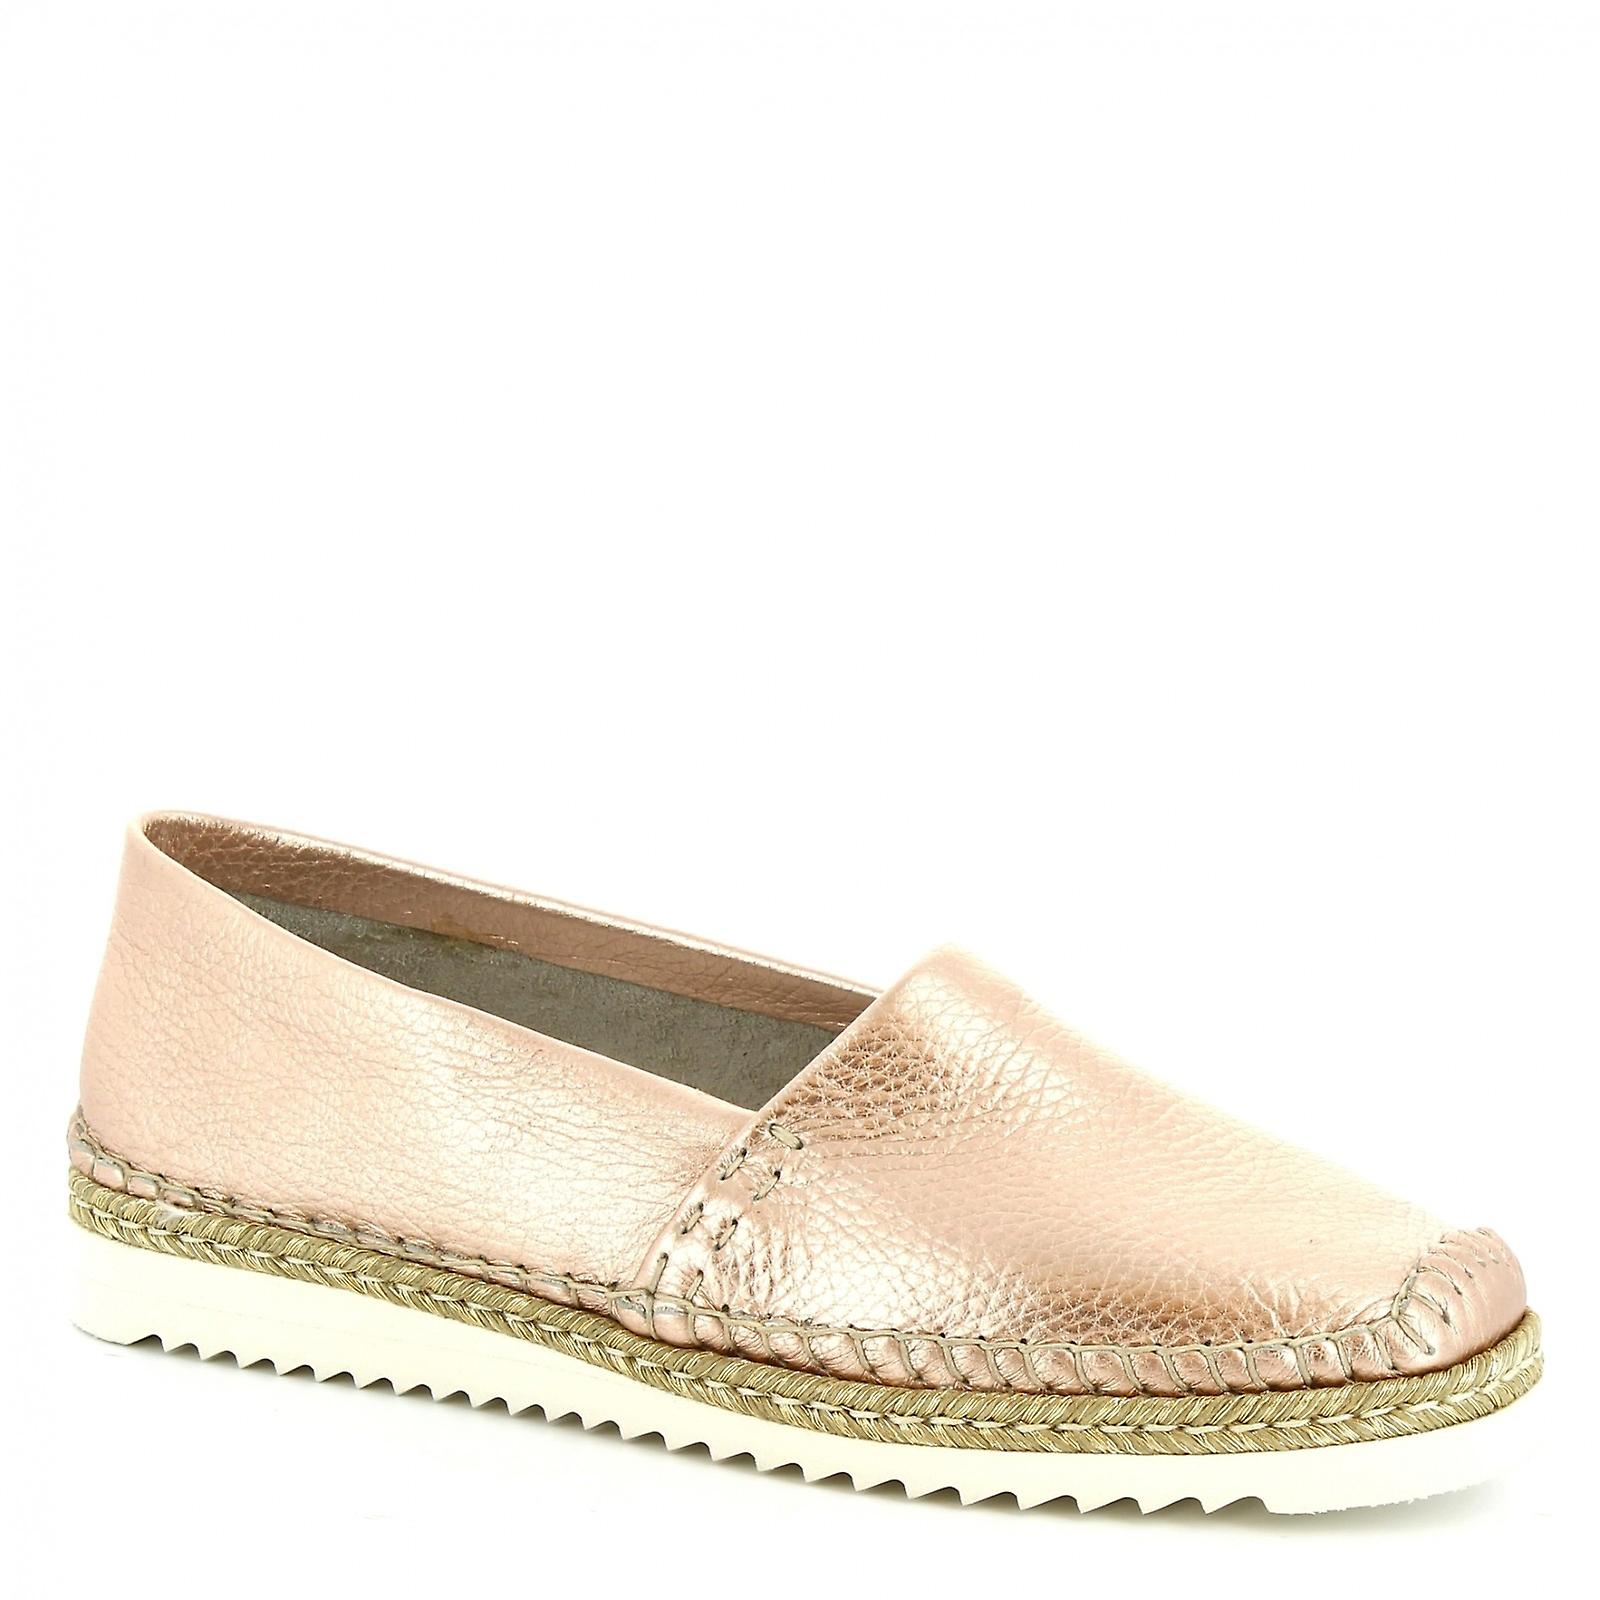 Leonardo Shoes Women's handmade slip-on loafers in pearl pink calf leather pu2Mf